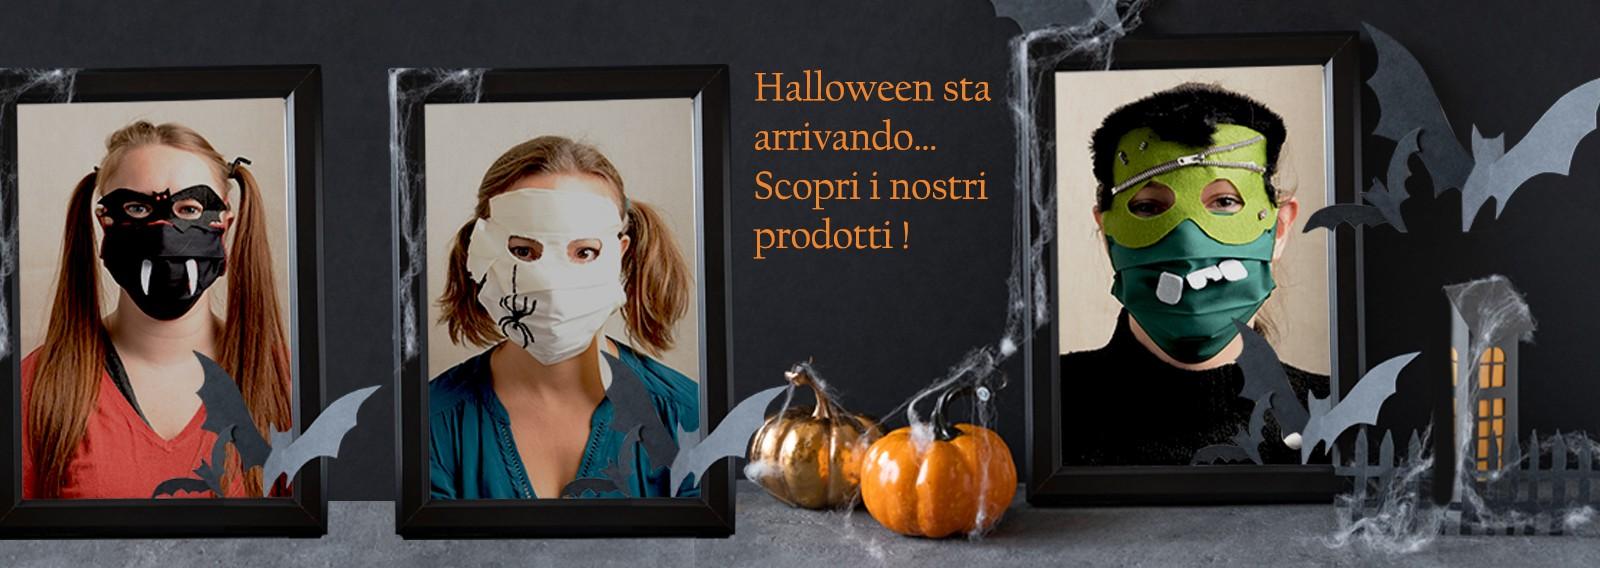 Halloween sta arrivando… Scopri i nostri prodotti